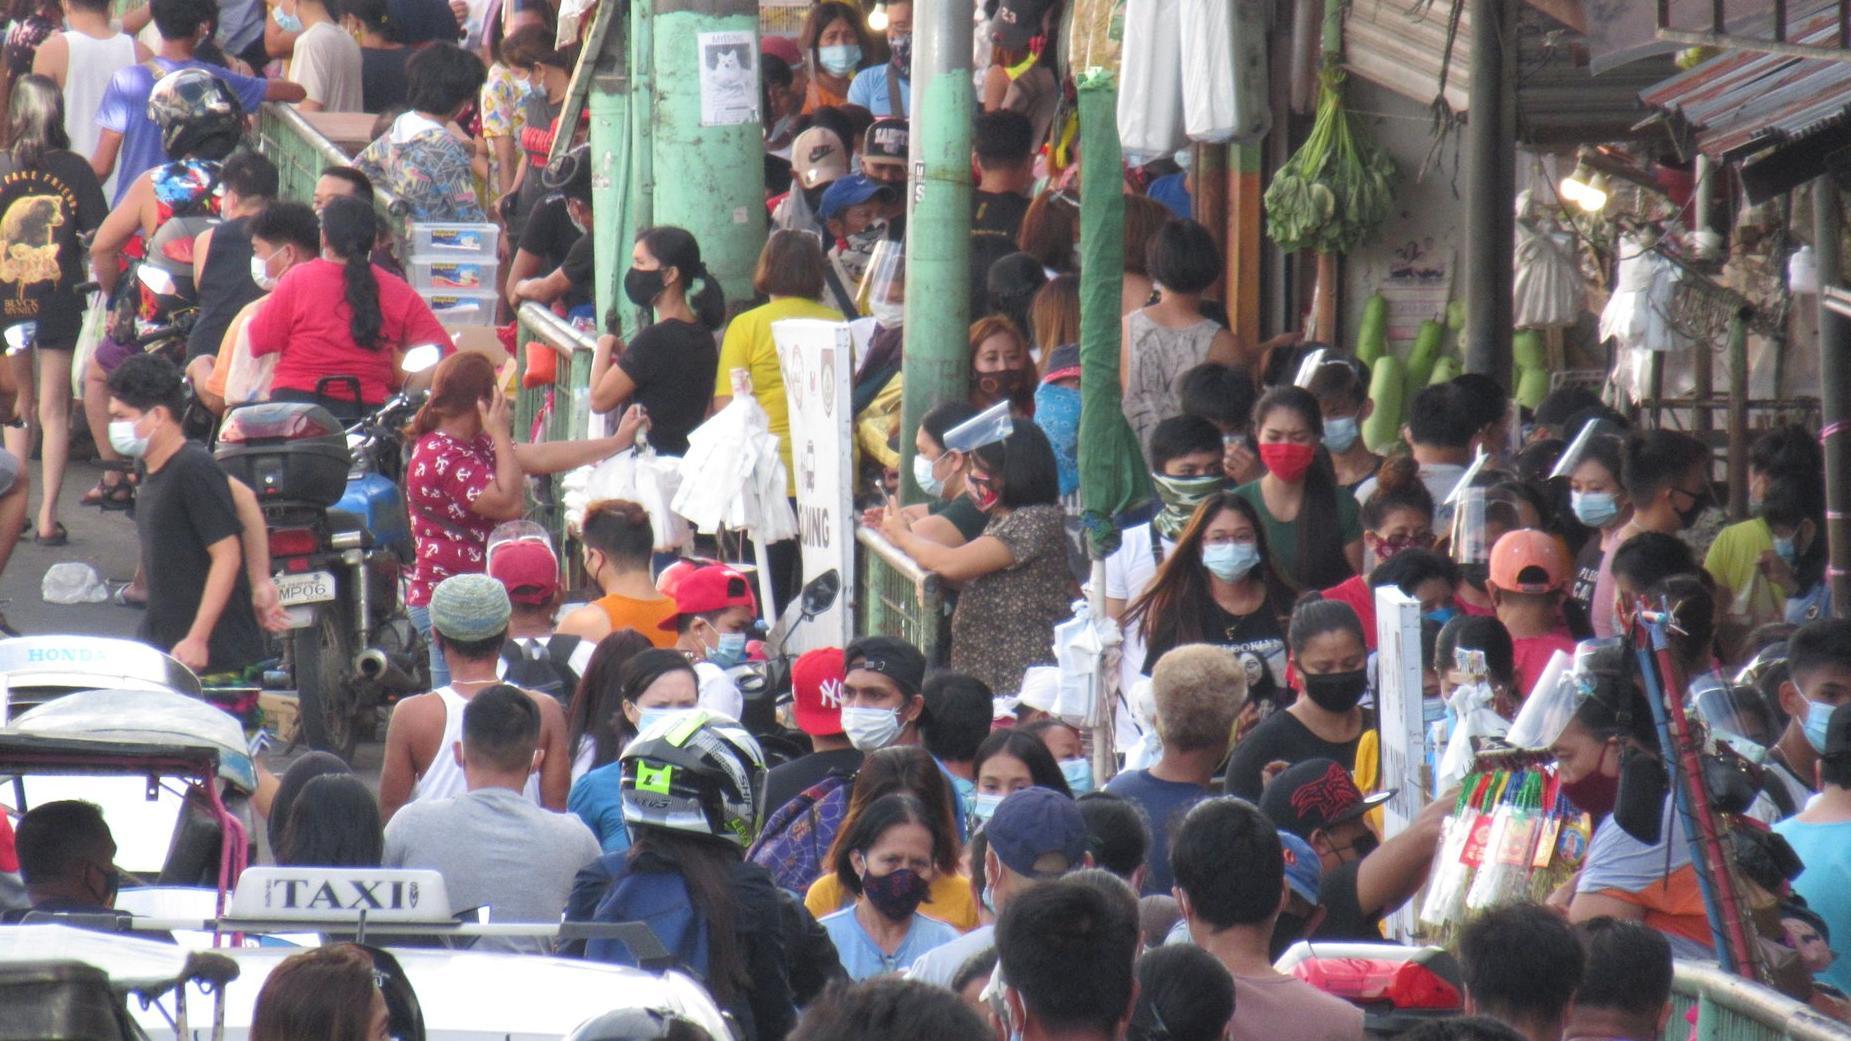 usdt钱包支付(caibao.it):菲律宾新增新冠肺炎确诊病例1097例 累计确诊476916例 第1张